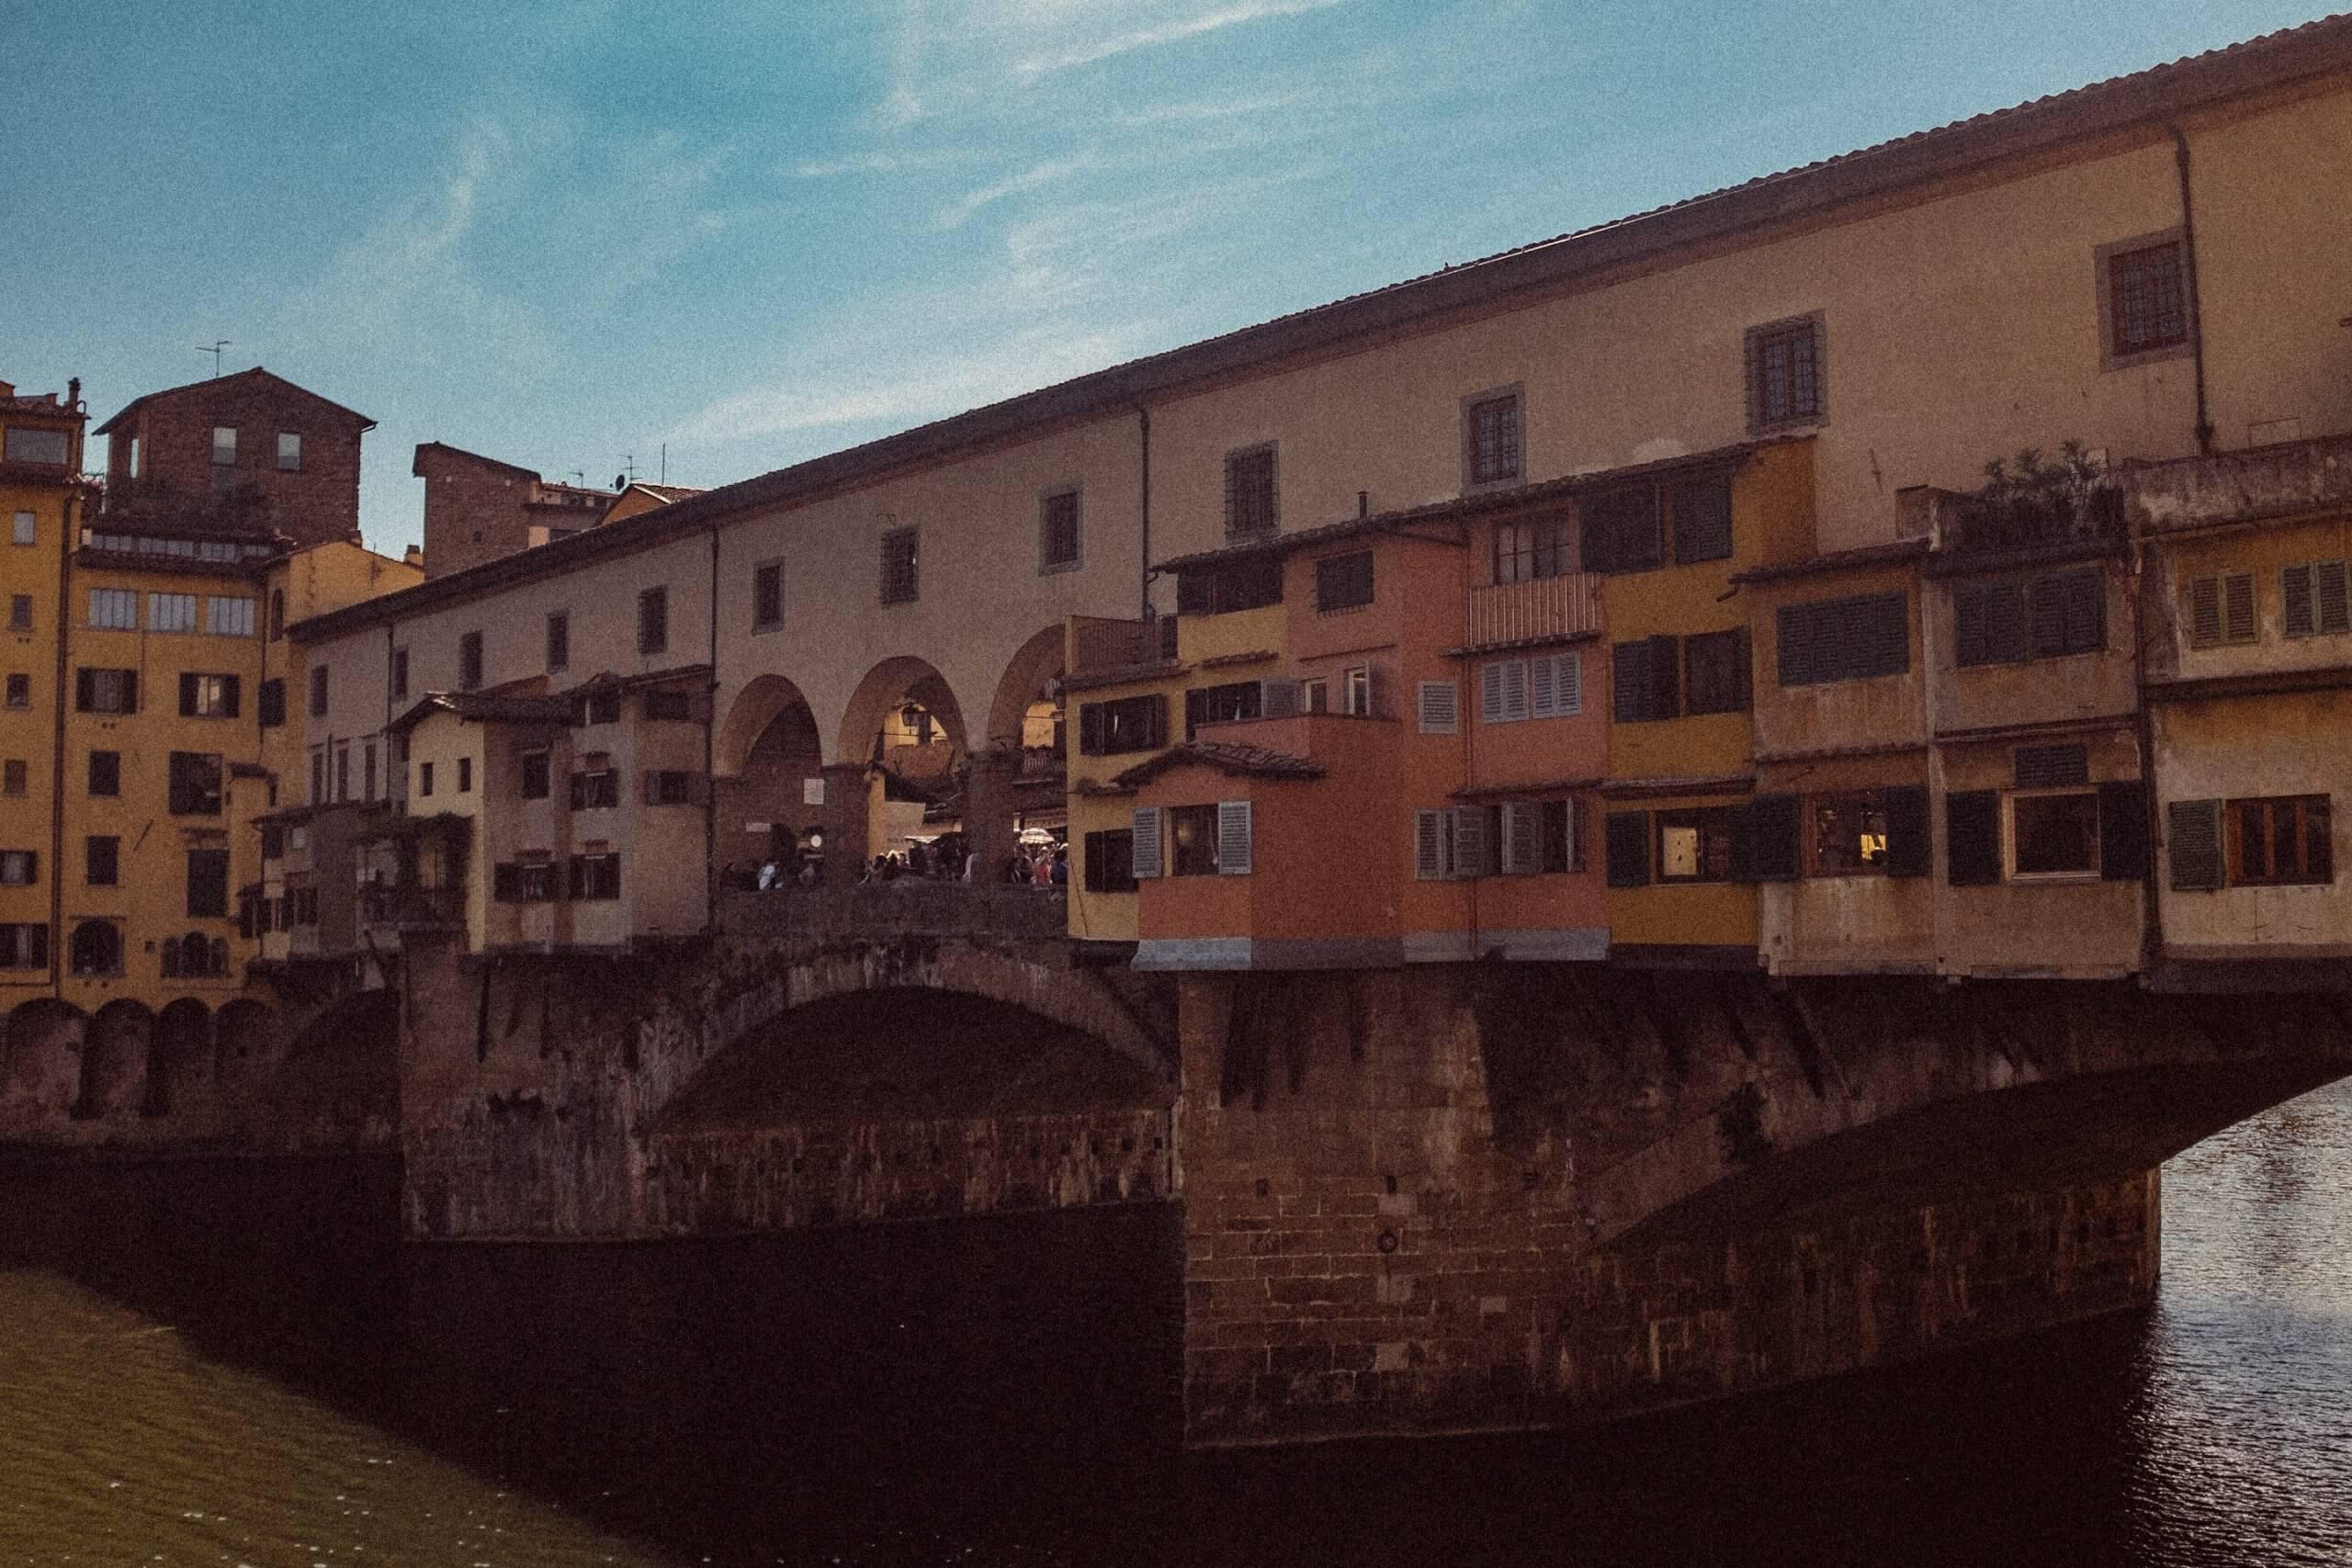 Travel-Florence-Photography-Johannes-Maur-1228